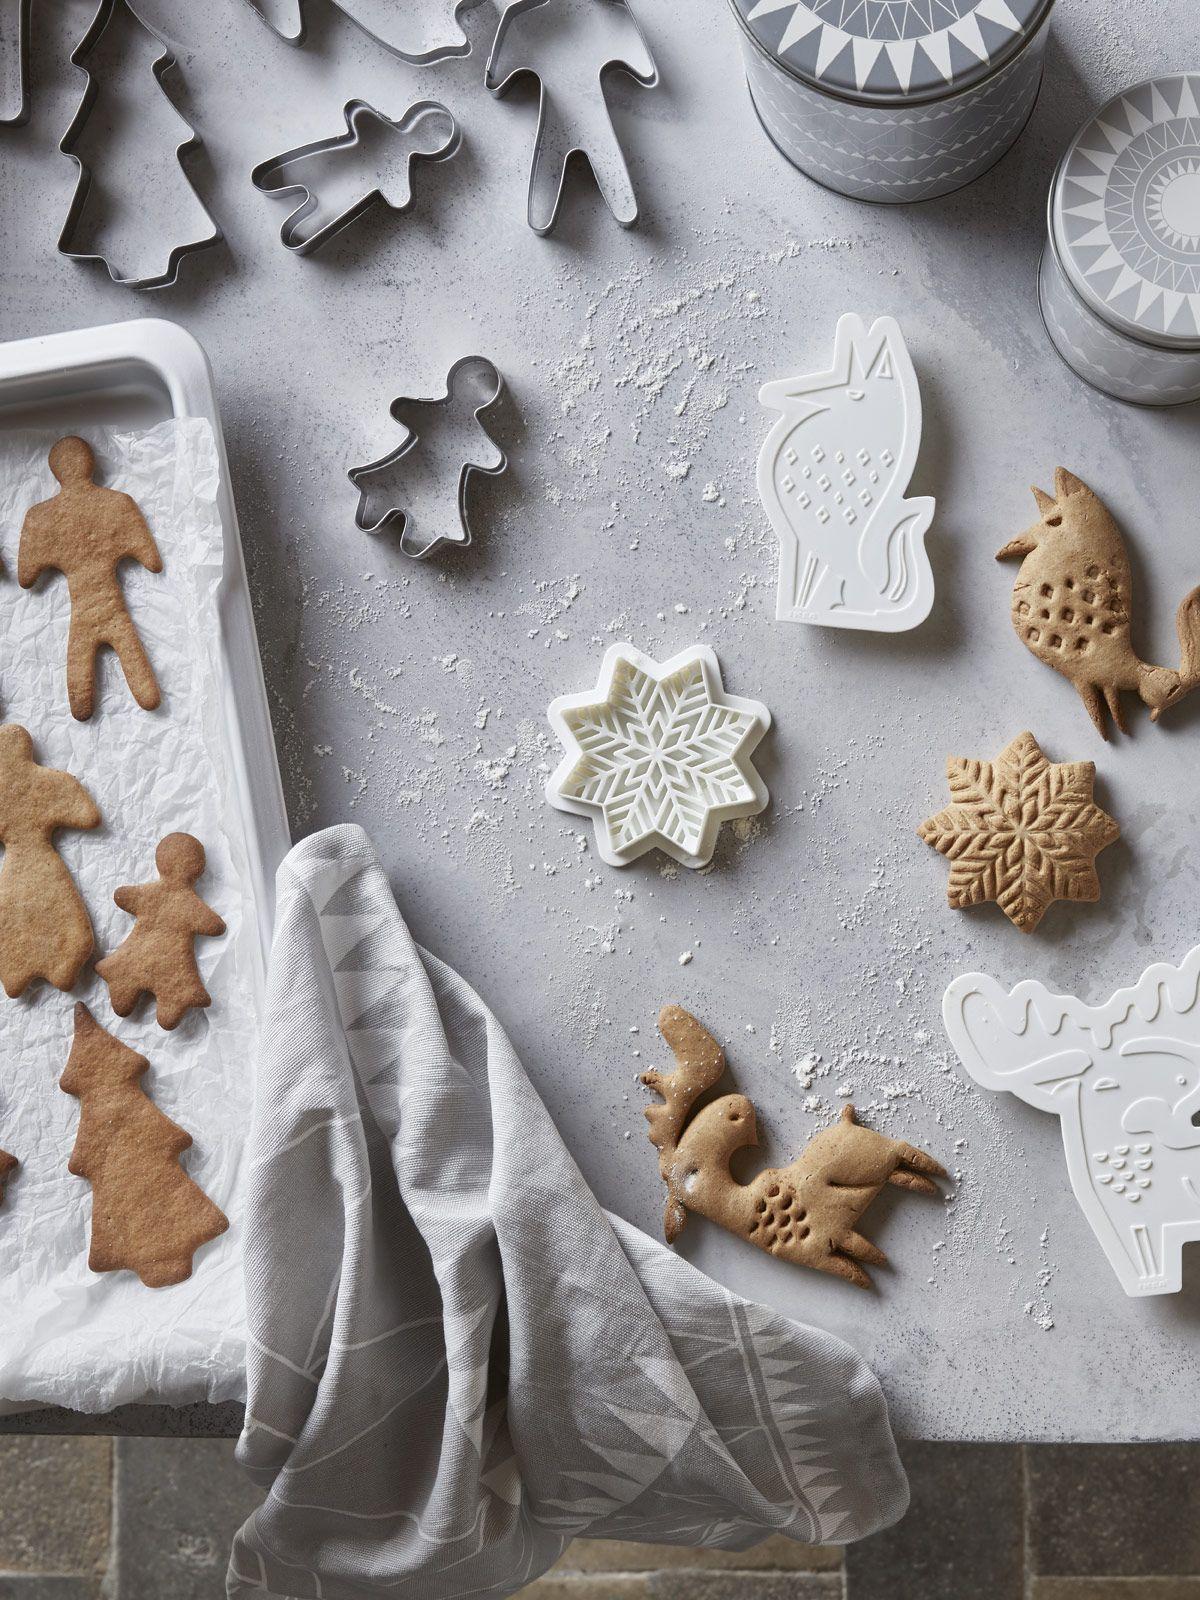 Ikea 6 Cookie Cutters Samlas Tree Star Heart 2 Bonus Angel